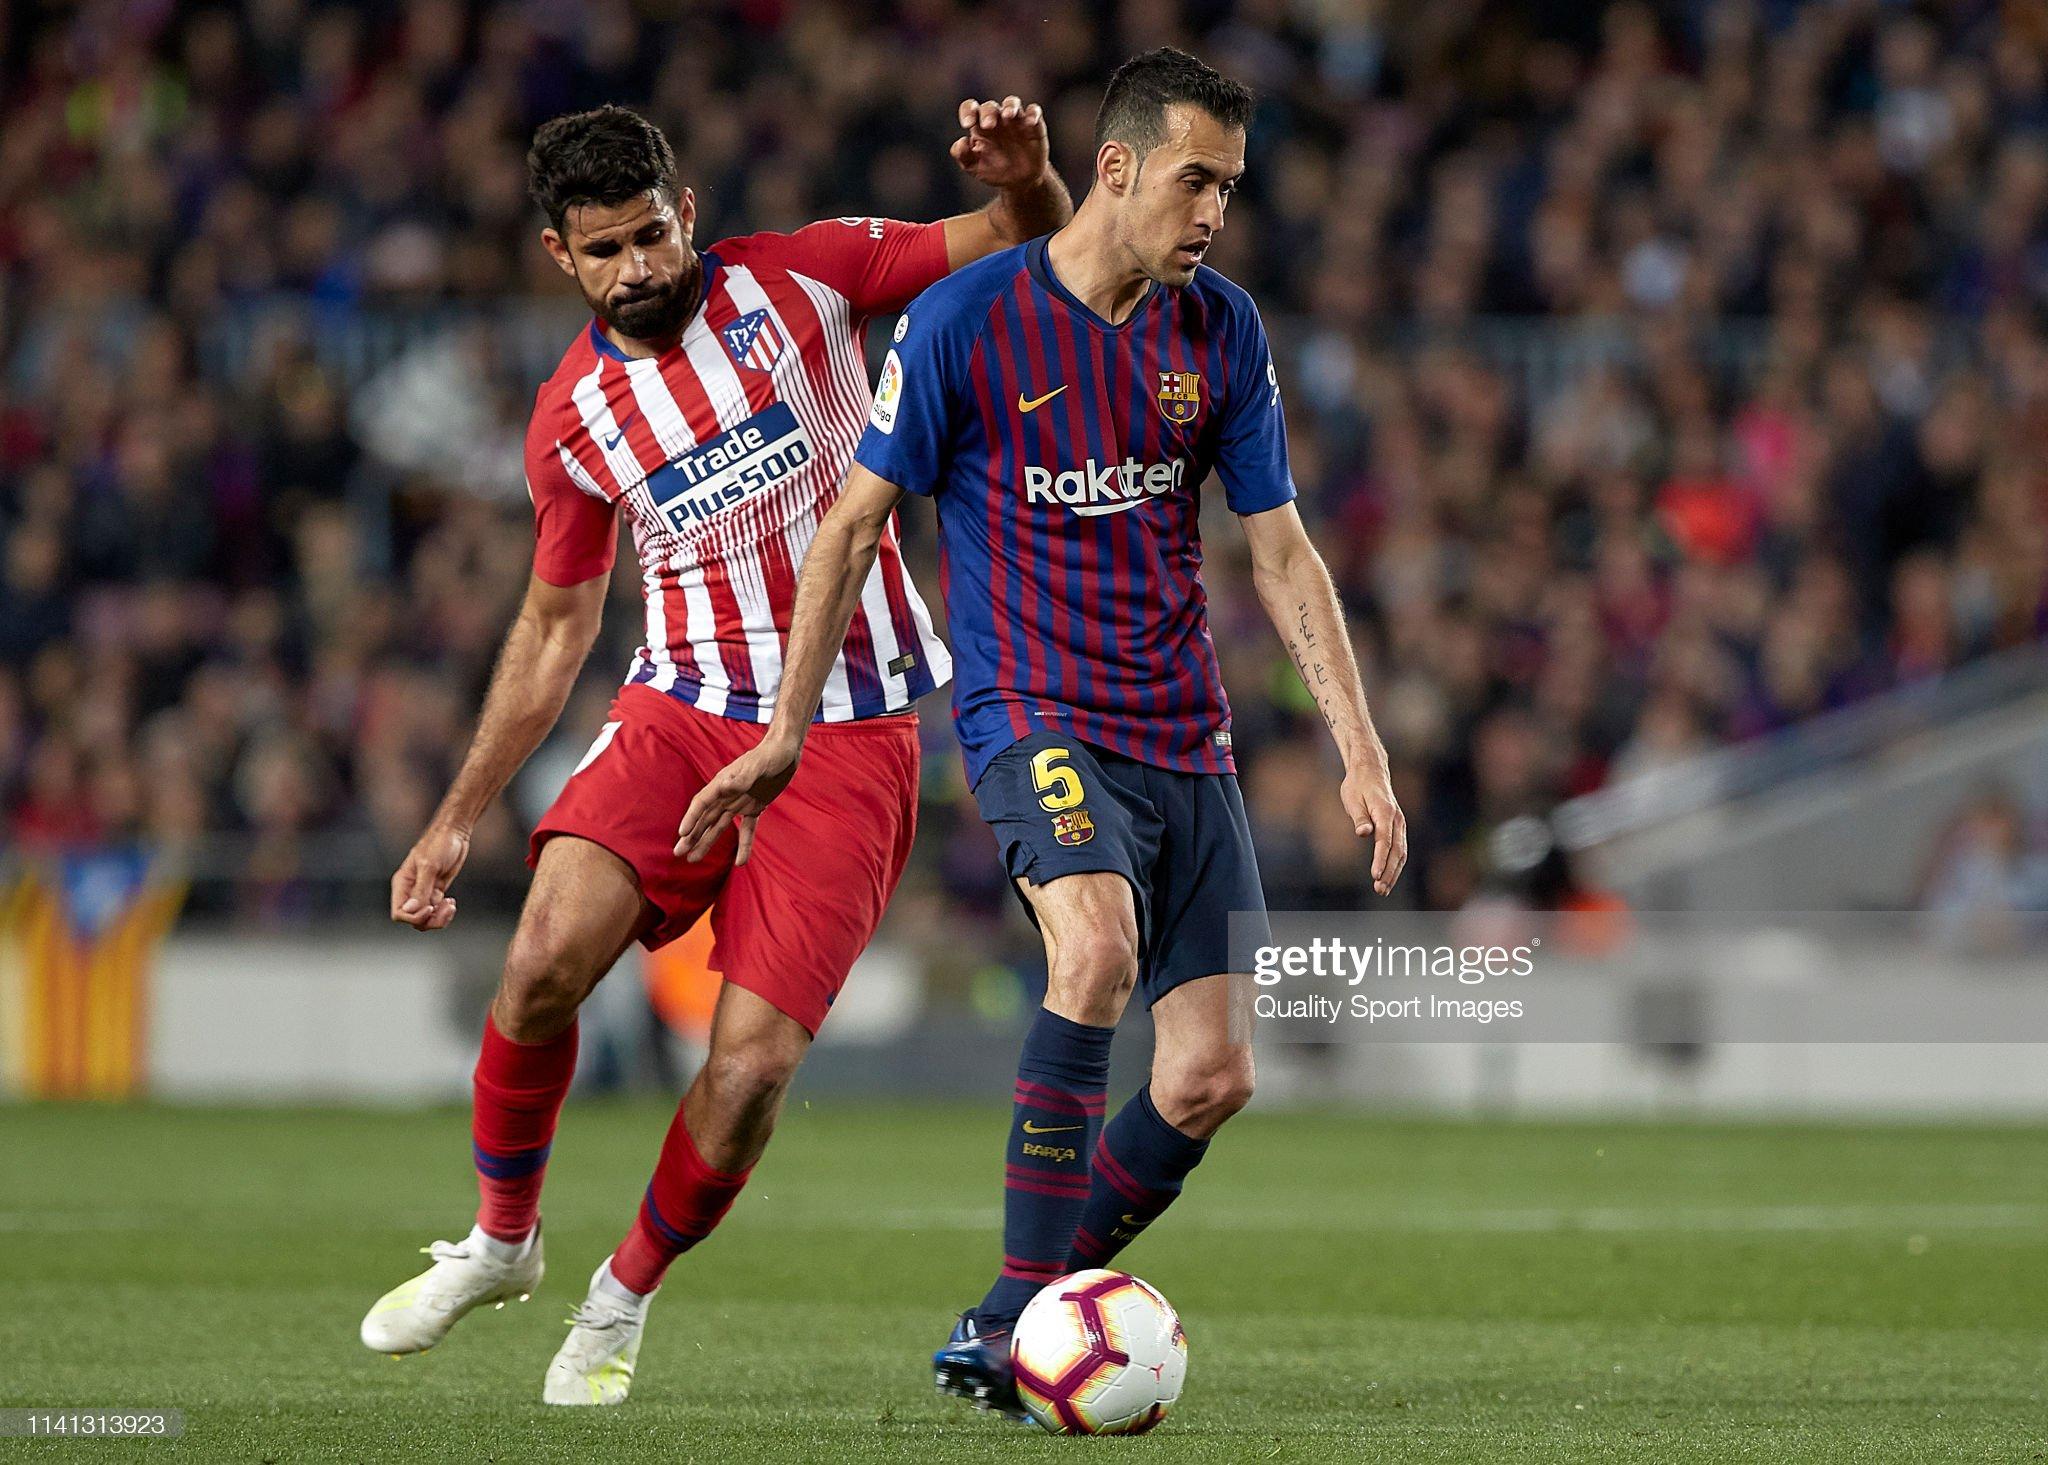 Barcelona vs Atletico Madrid Preview, prediction and odds